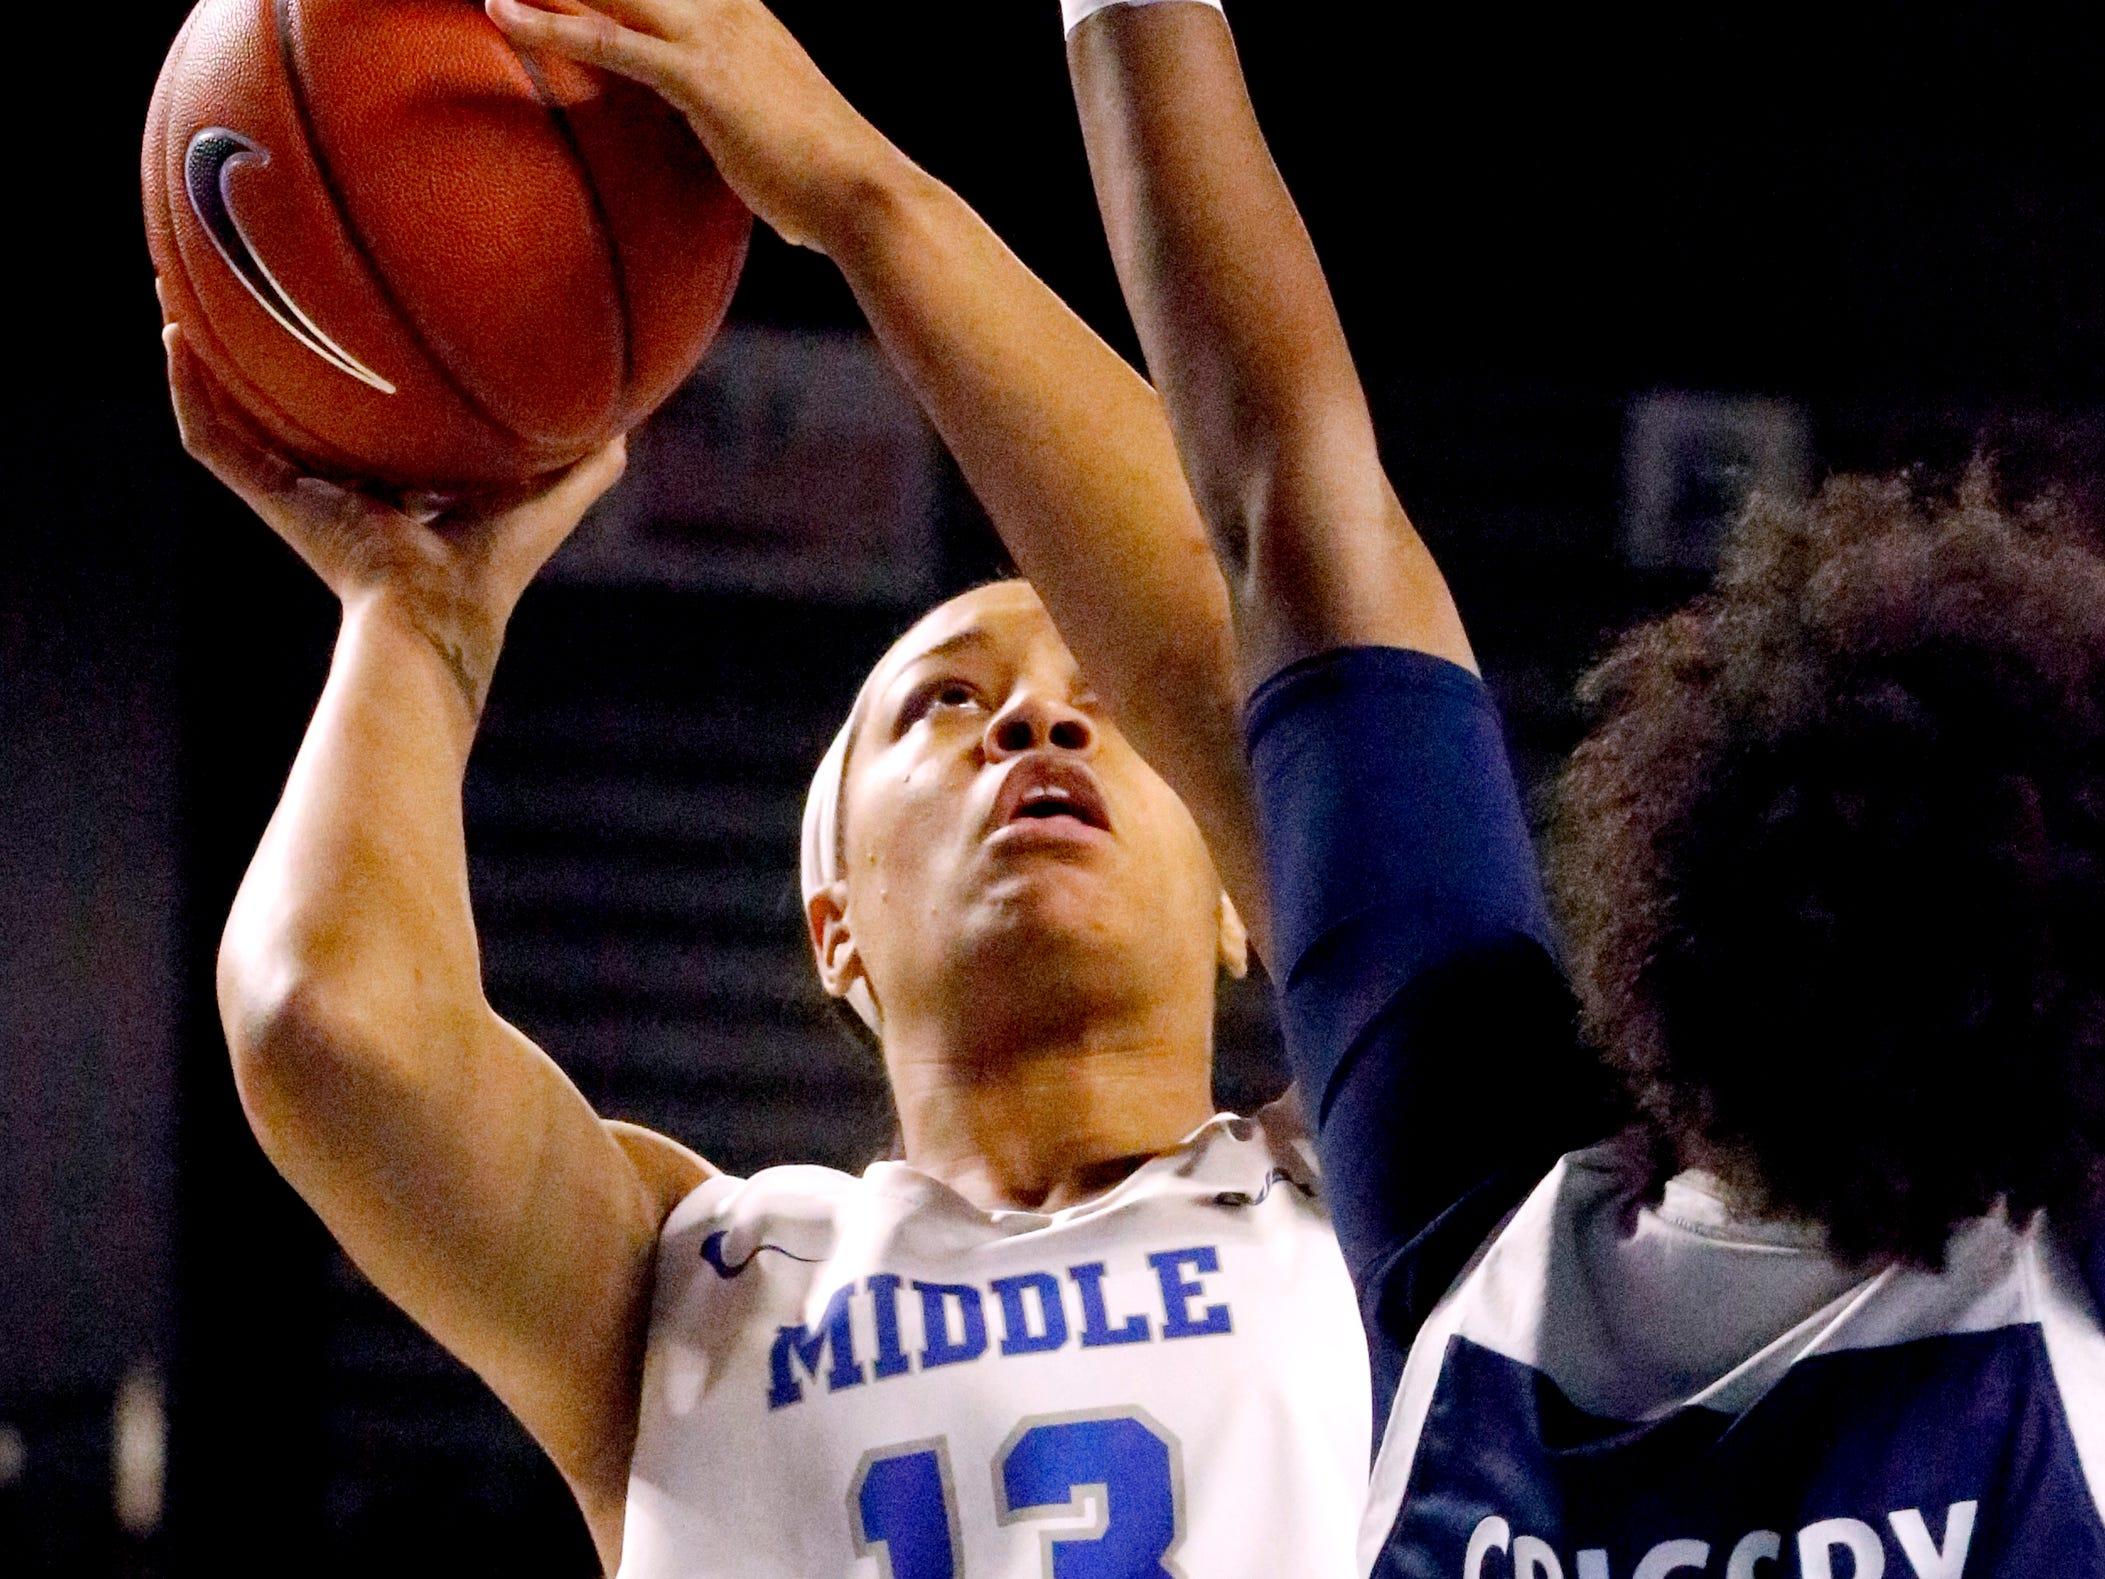 MTSU's forward Jordan Majors (13) shoots the ball as Rice's guard Lauren Grigsby (5) guards her on Thursday Jan. 24, 2019.